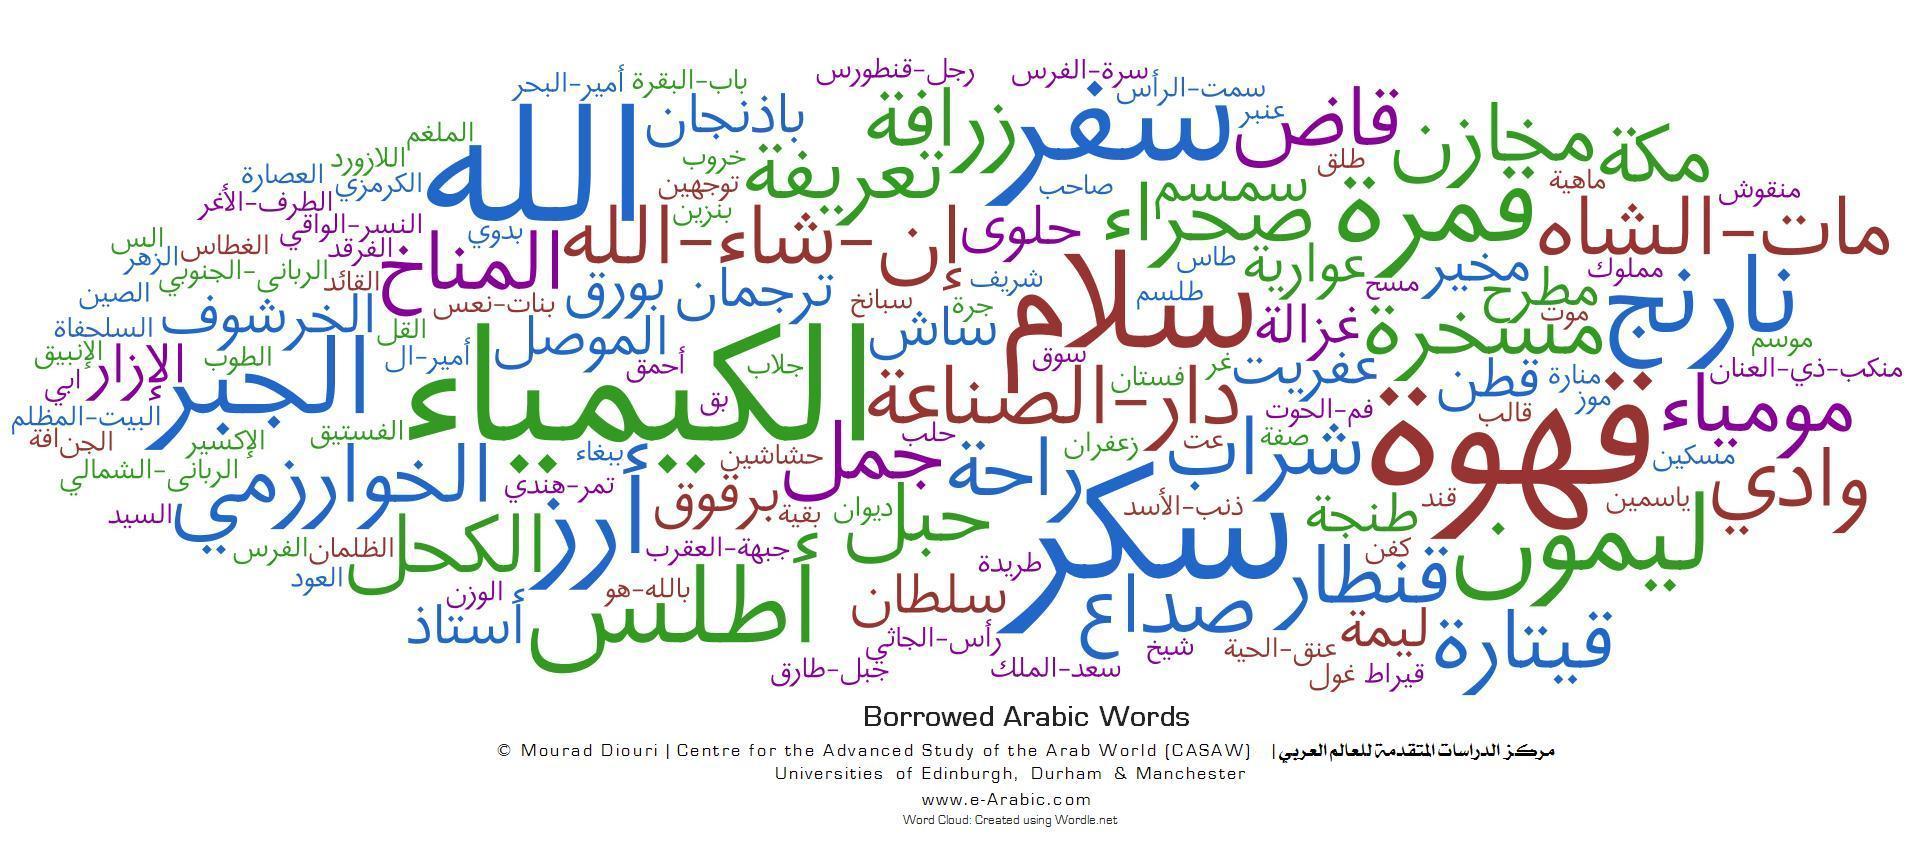 Arabic languages